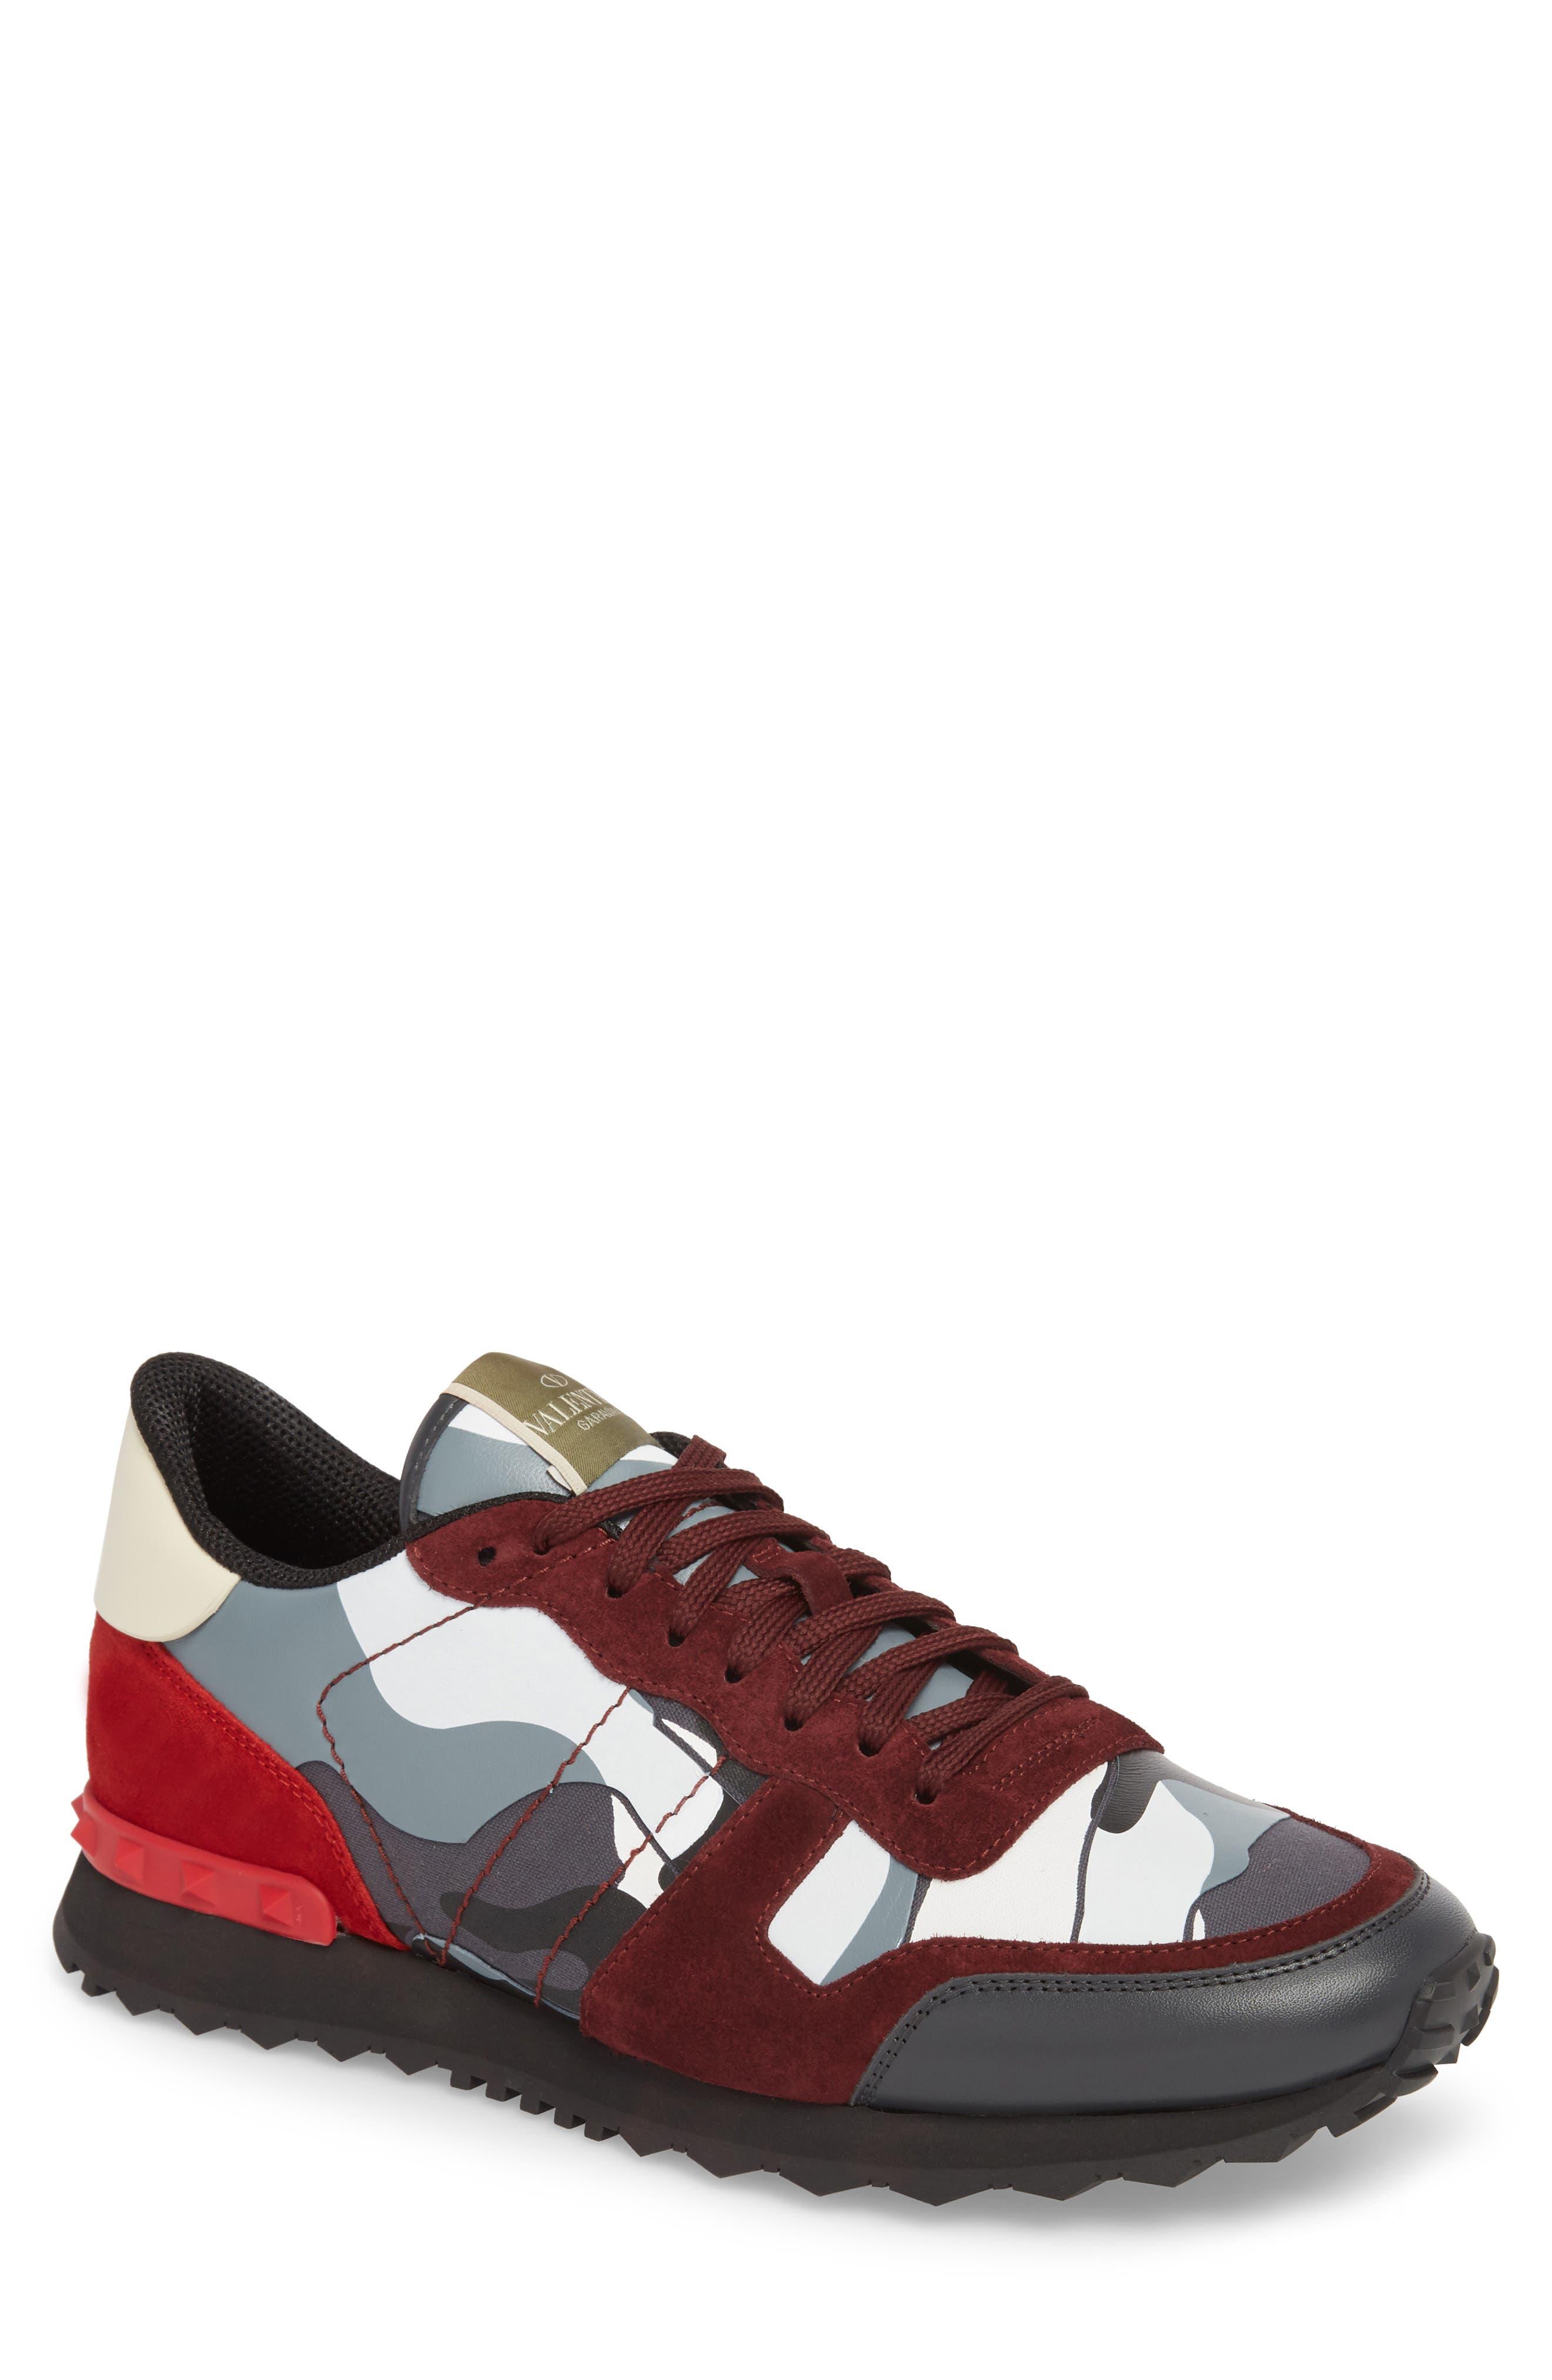 Camo Rockrunner Sneaker by Valentino Garavani